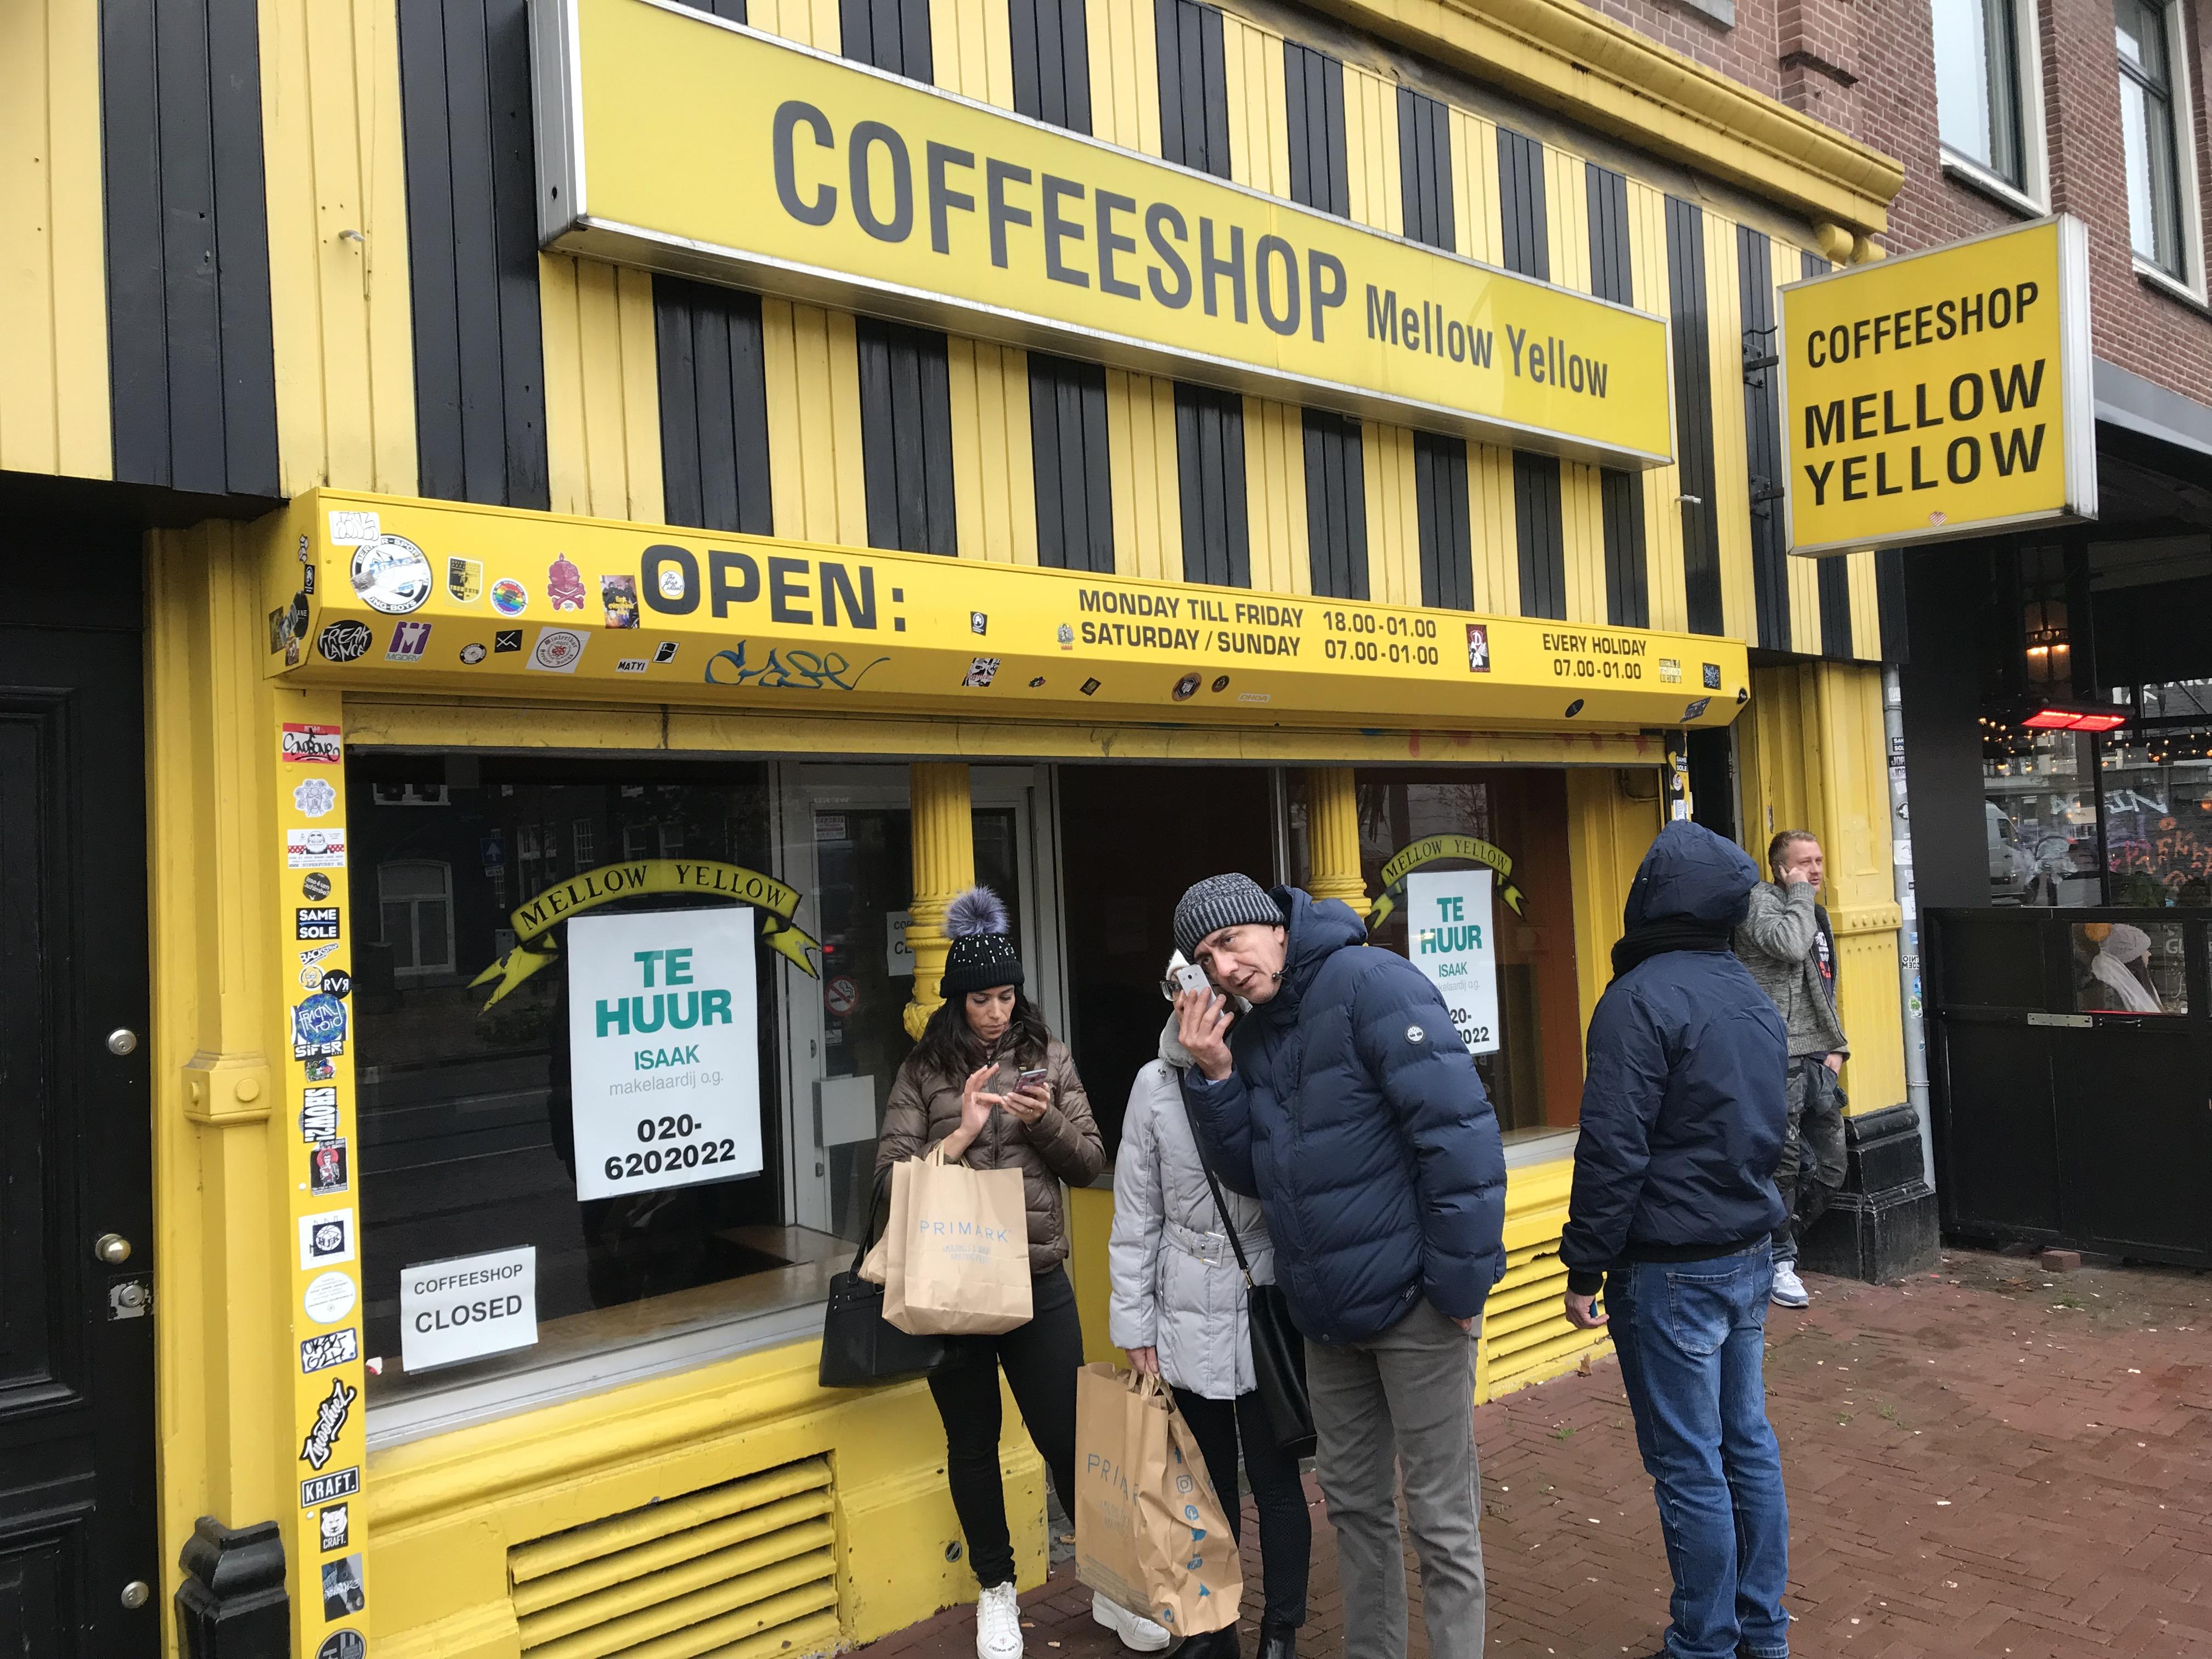 mellowyellow Amsterdam